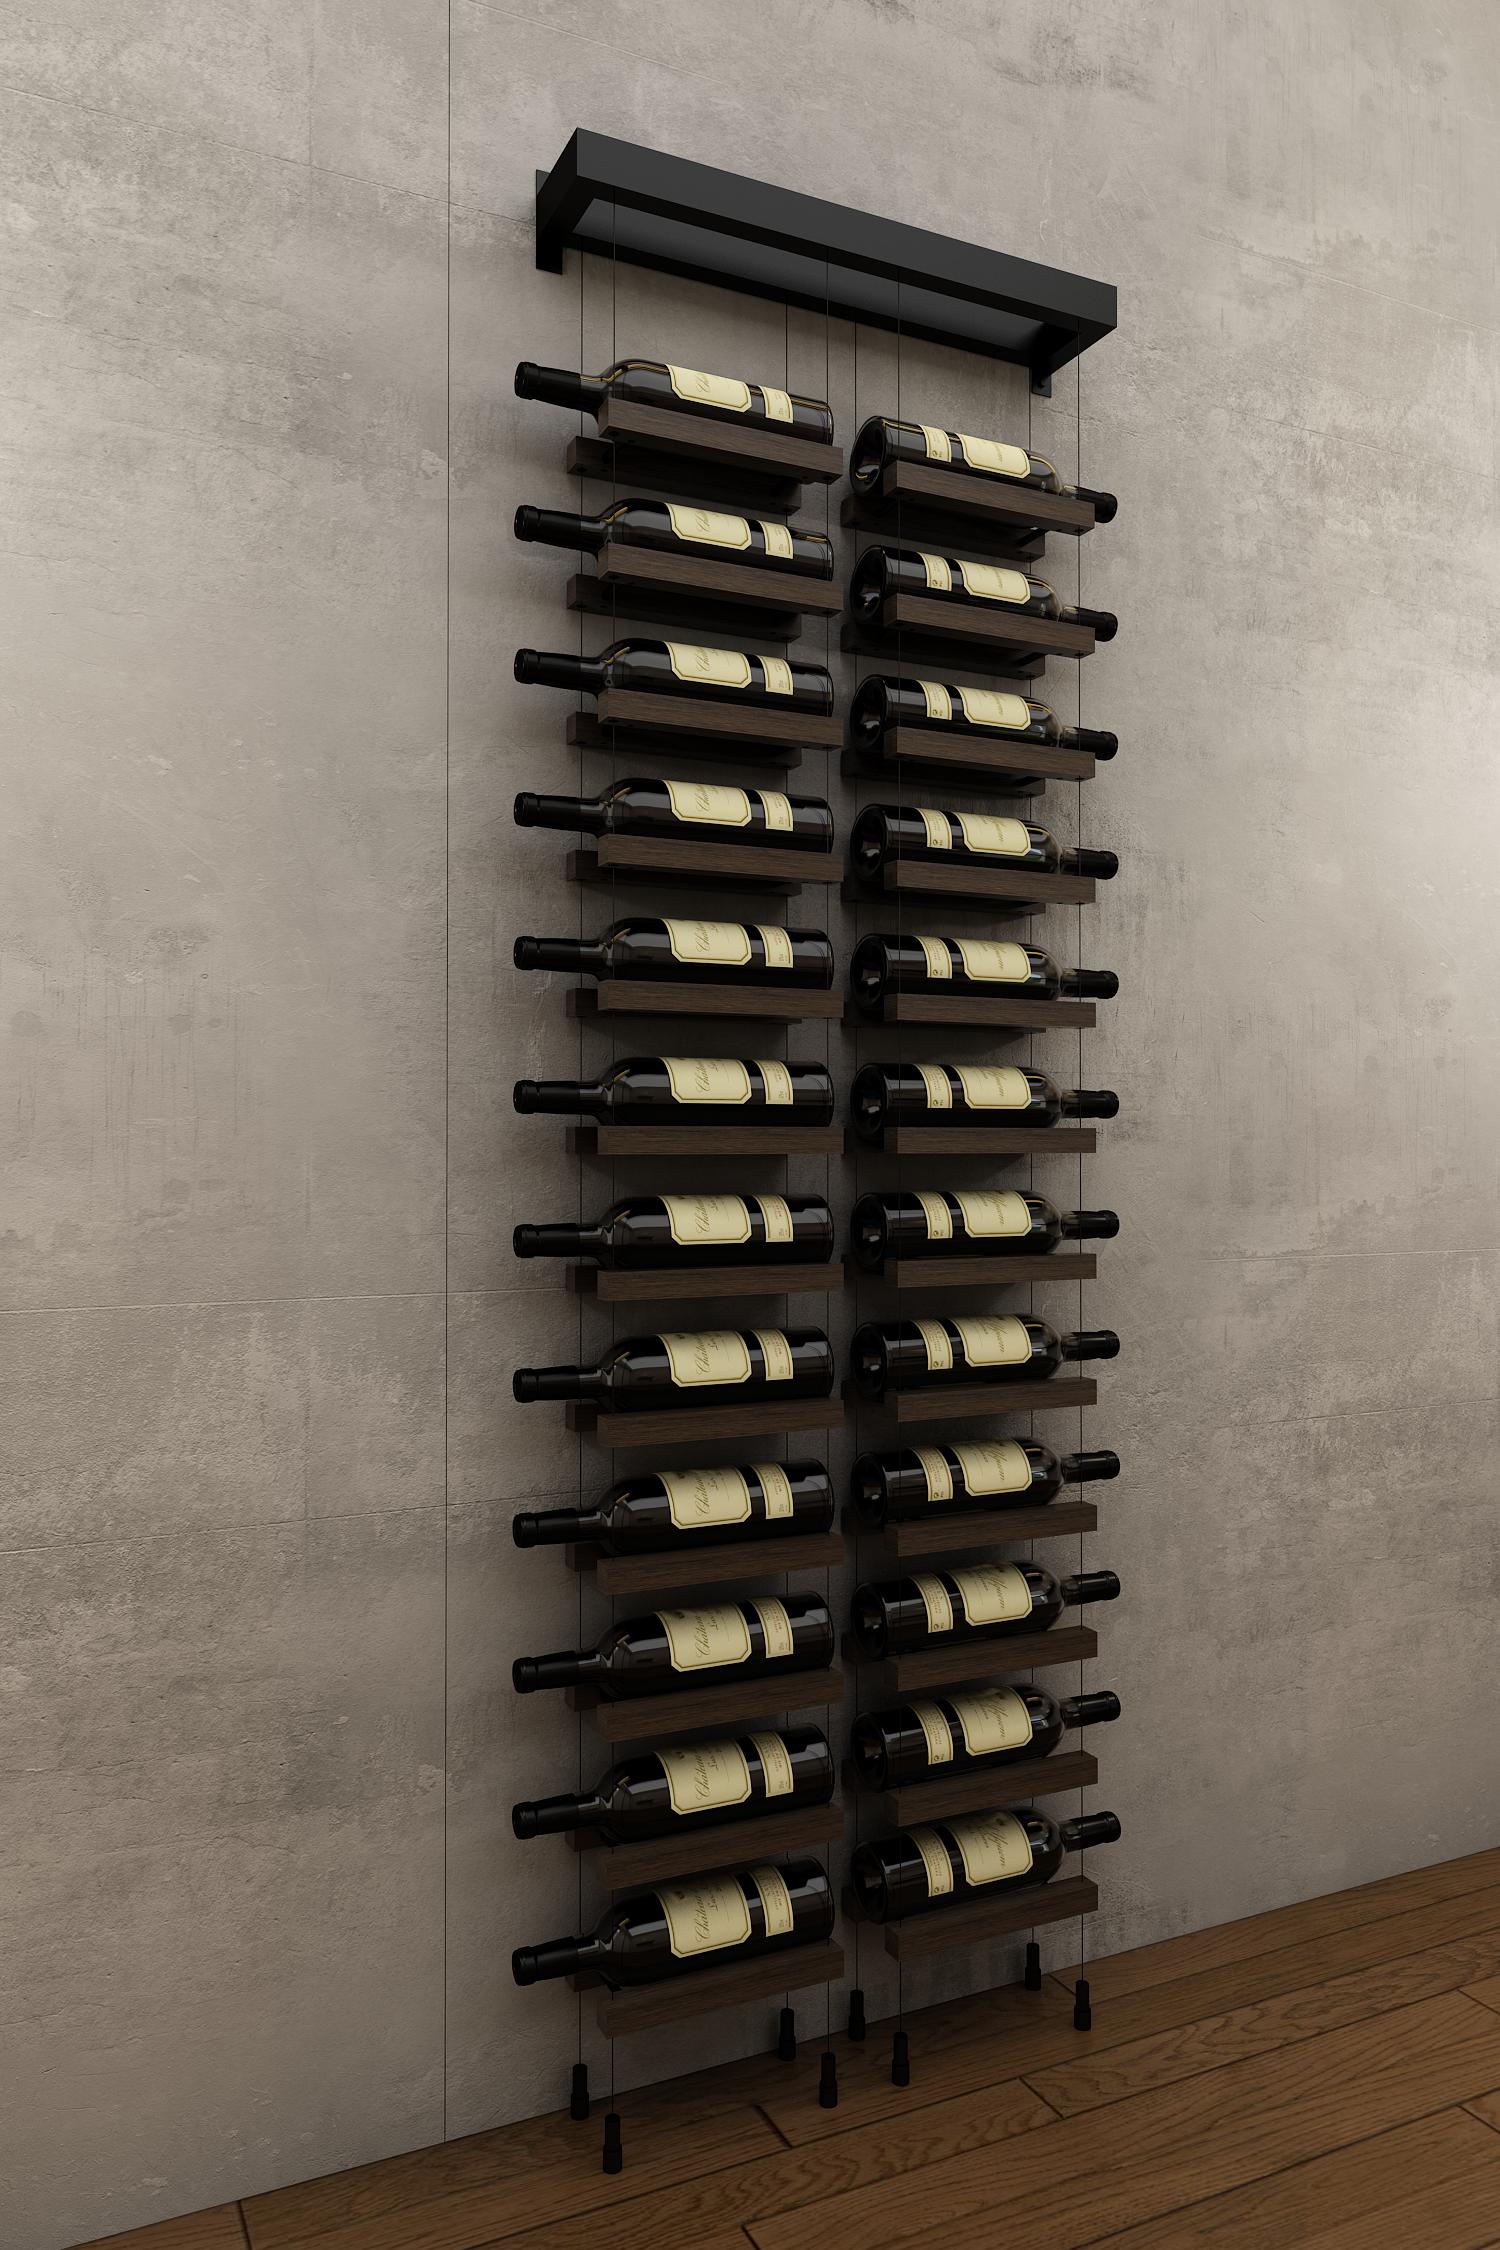 Wm24 Black Modern Wine Rack Wall Hanging Wine Rack Wine Rack